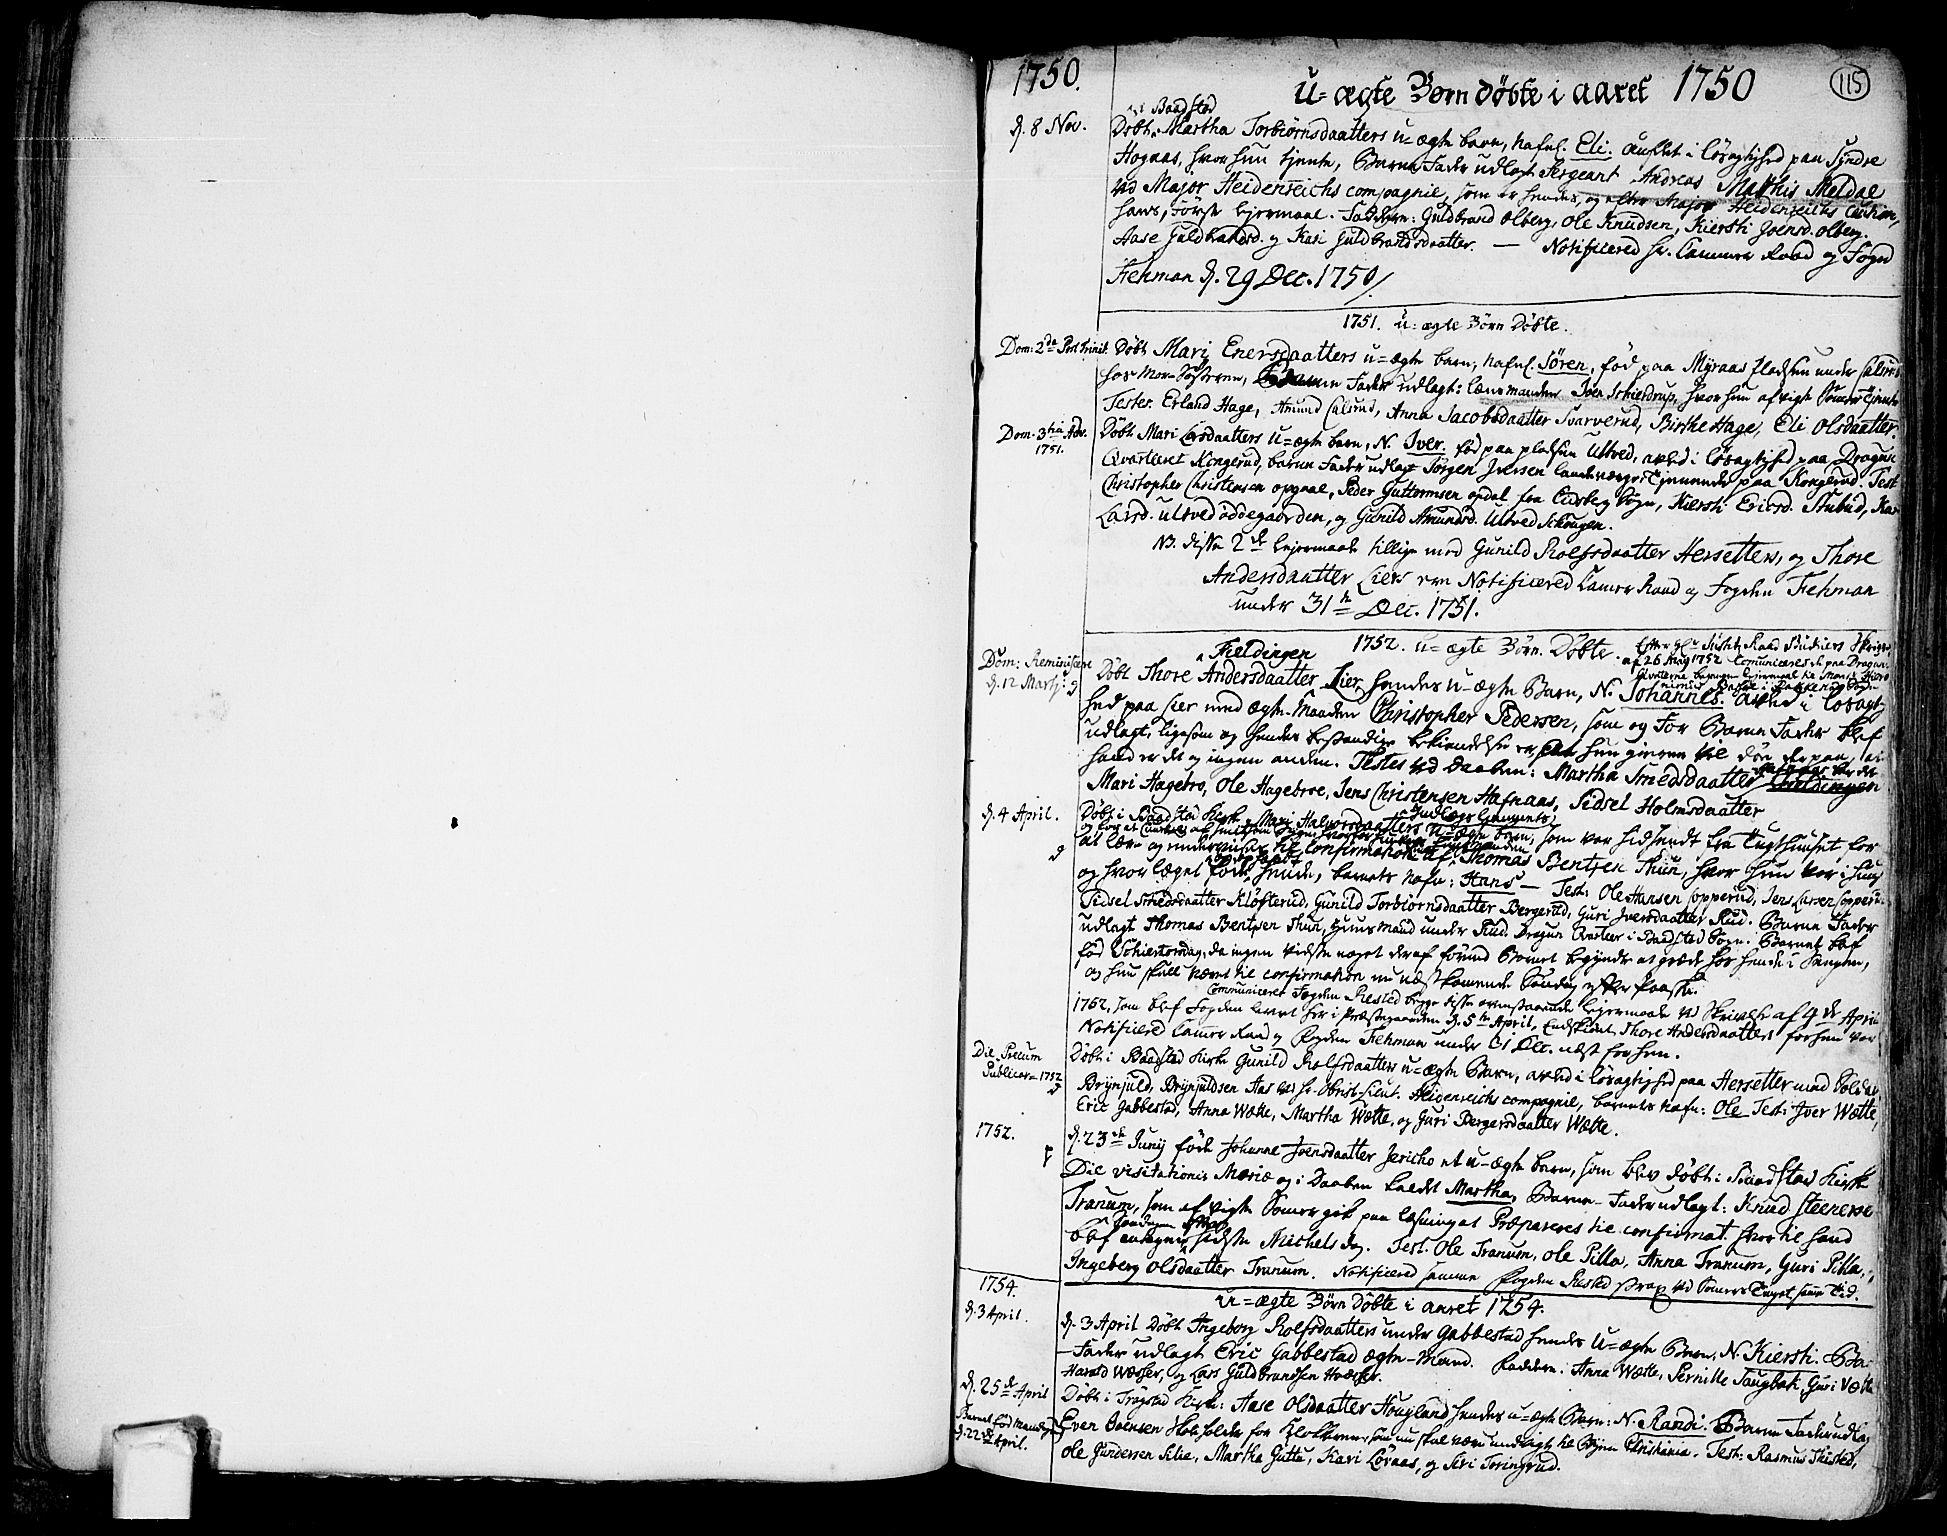 SAO, Trøgstad prestekontor Kirkebøker, F/Fa/L0004: Ministerialbok nr. I 4, 1750-1784, s. 115